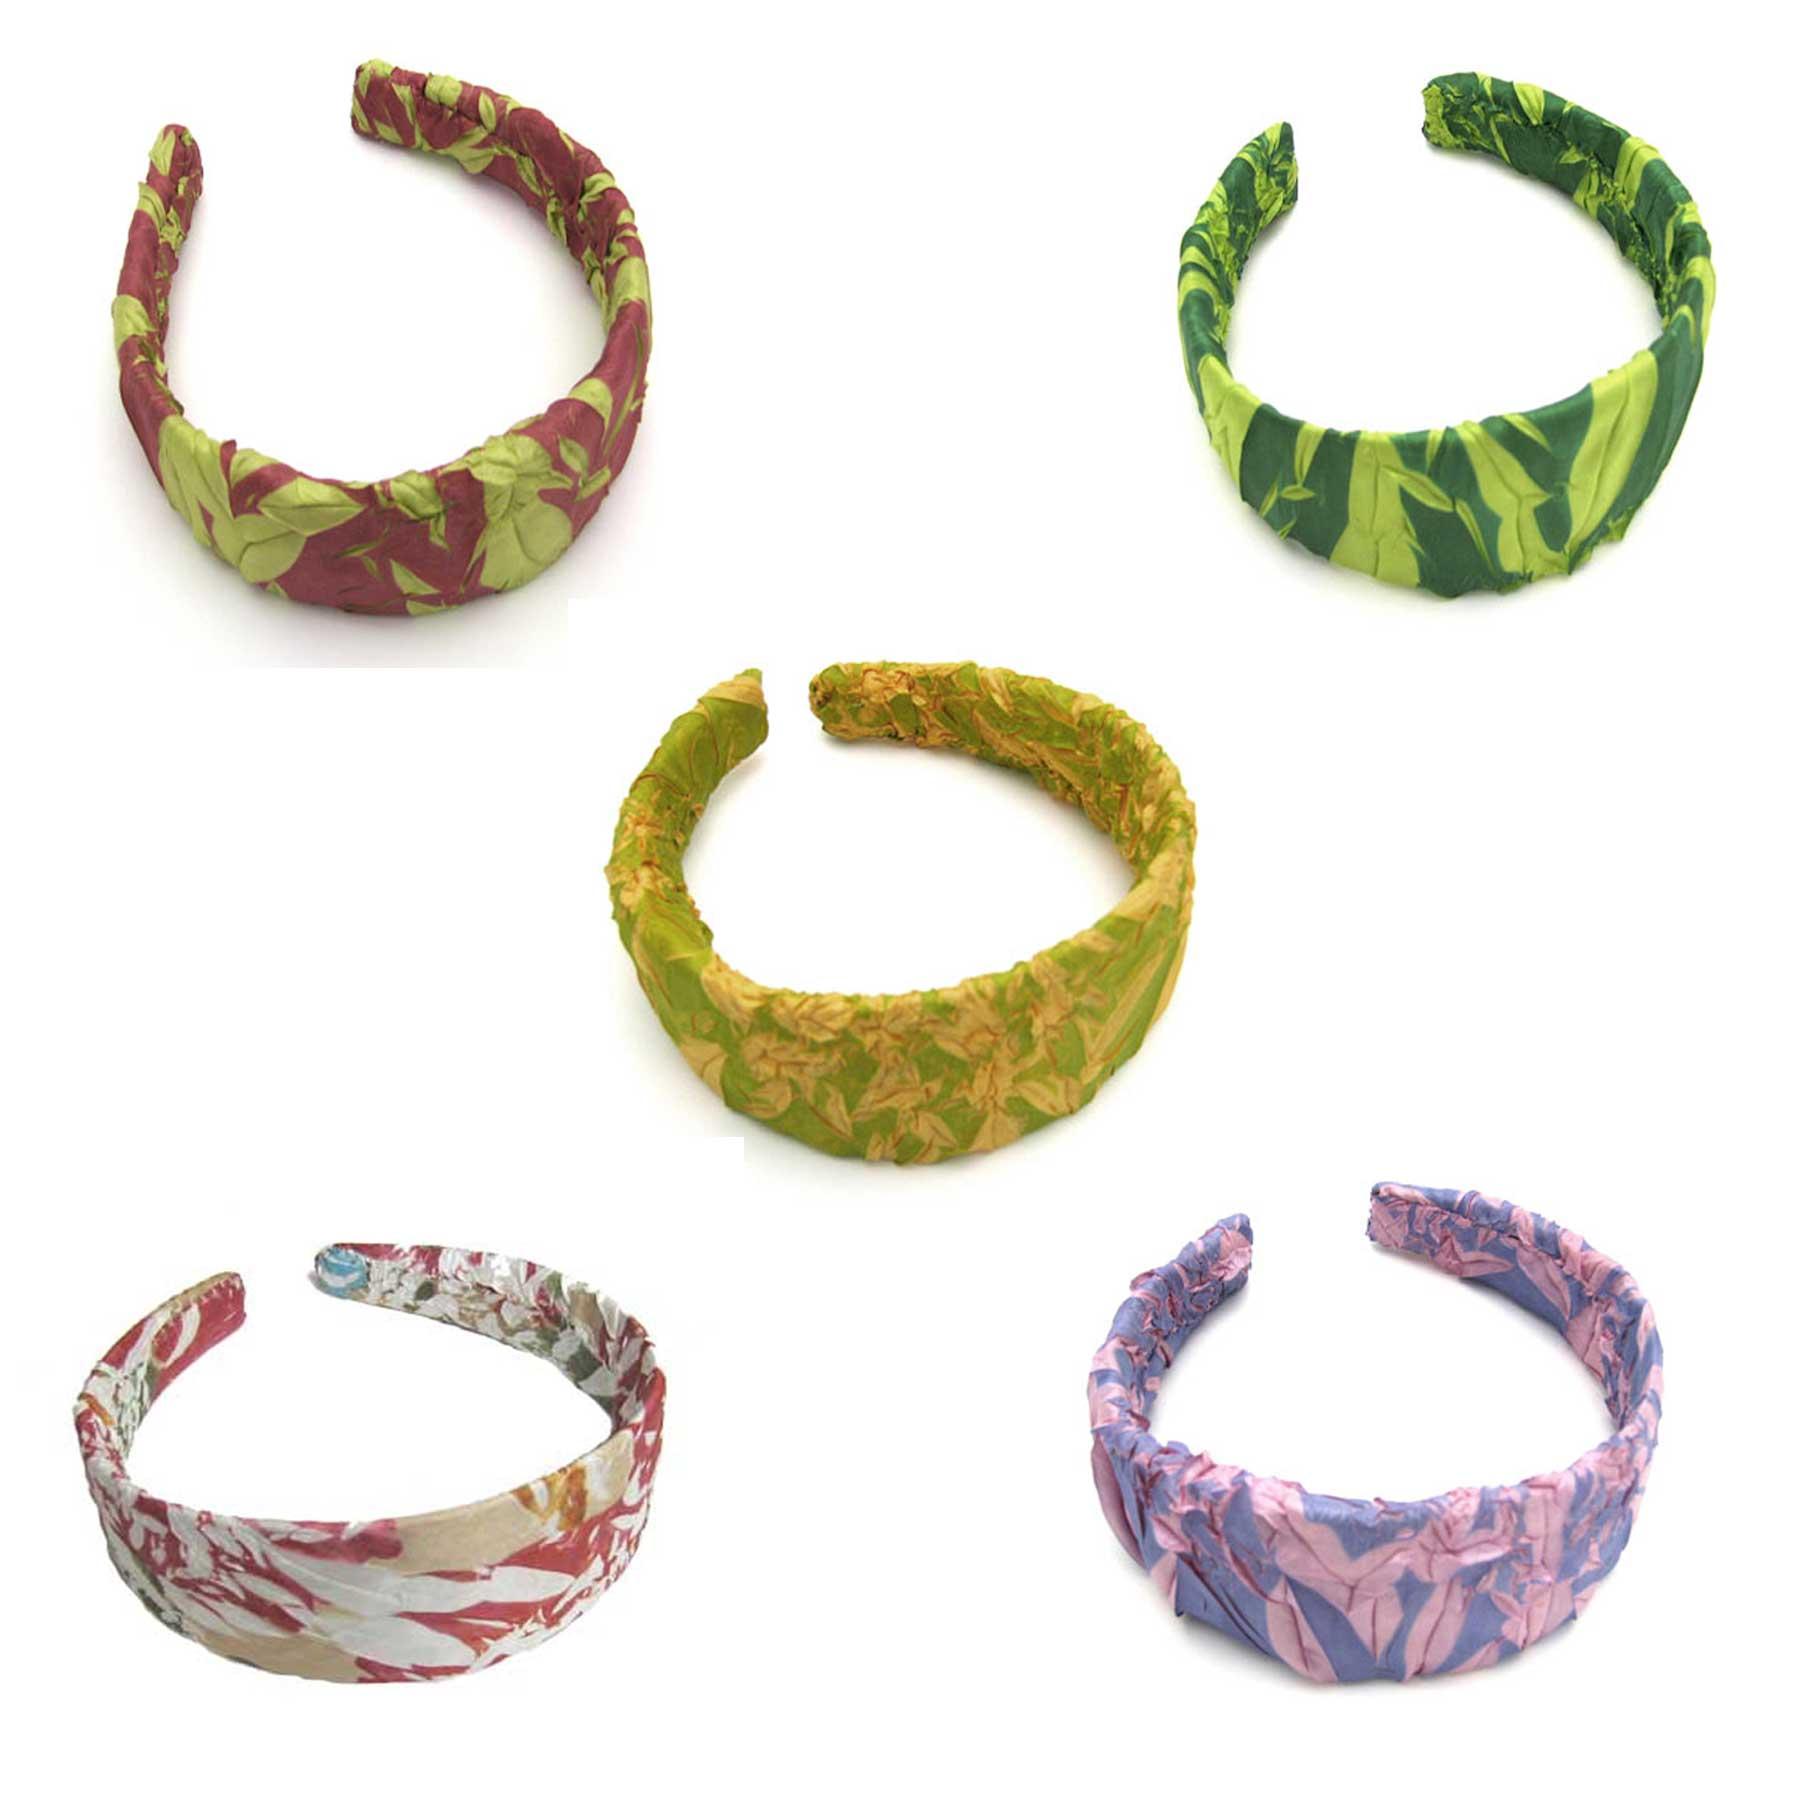 Origami Headbands*